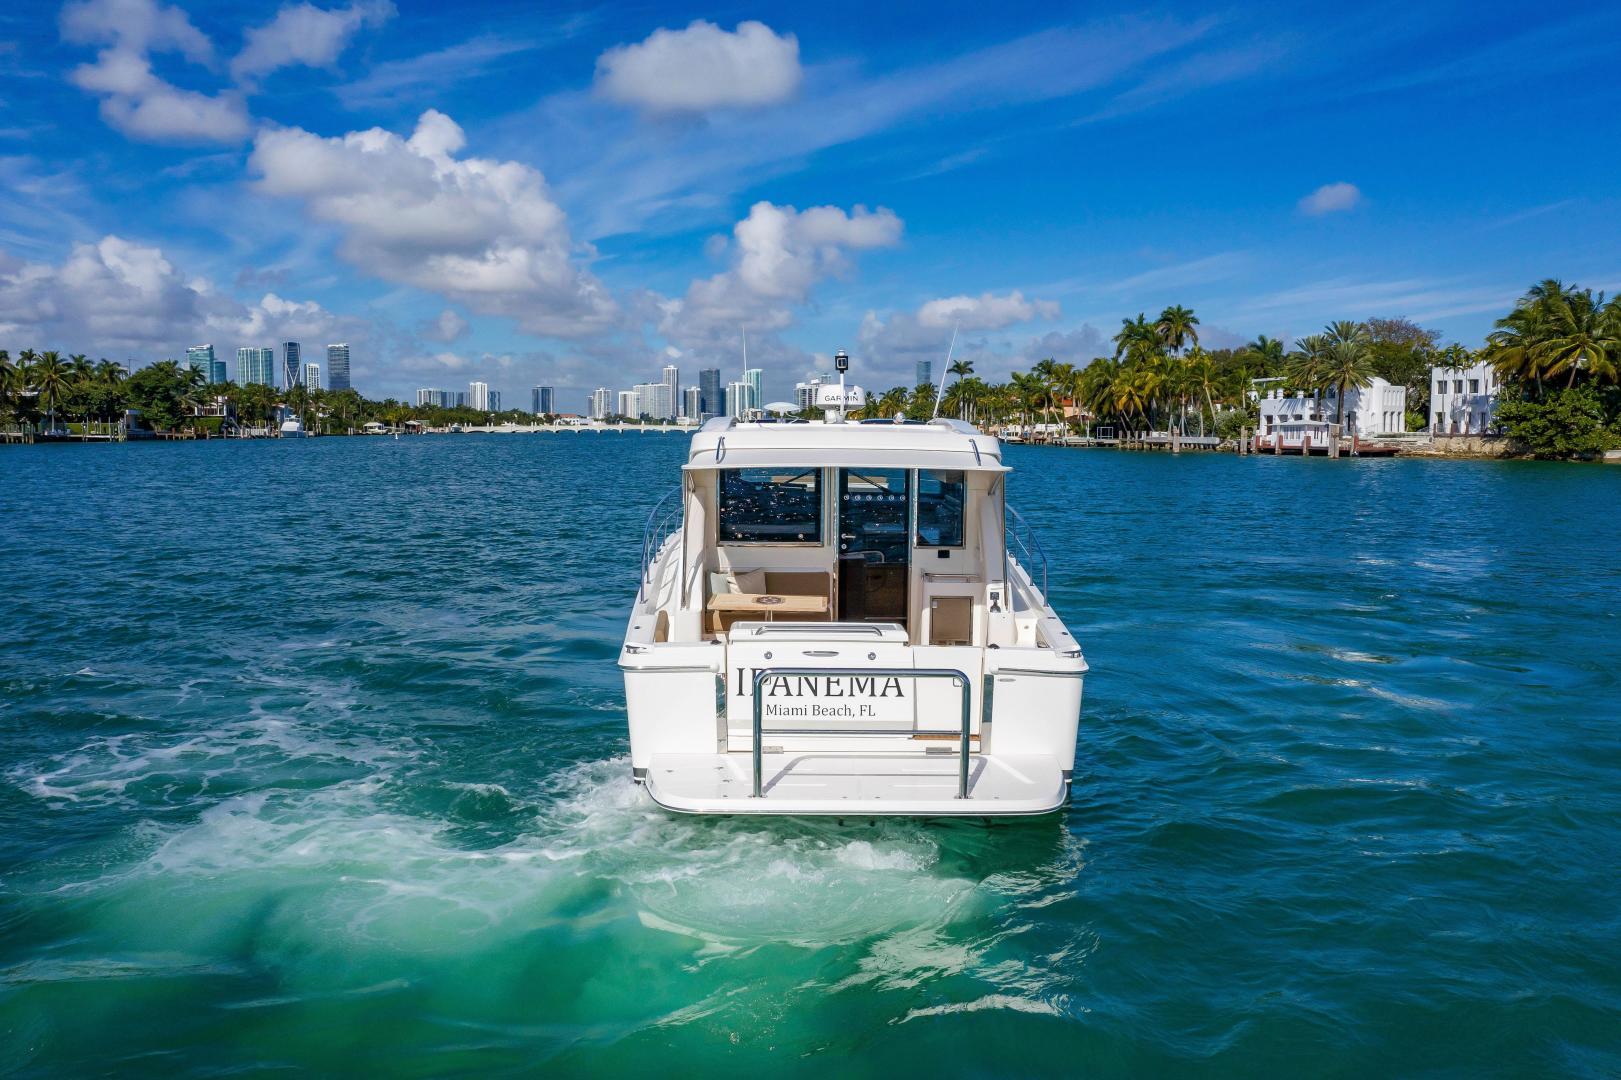 Riviera-395 SUV 2019-Ipanema Miami Beach-Florida-United States-1614872   Thumbnail